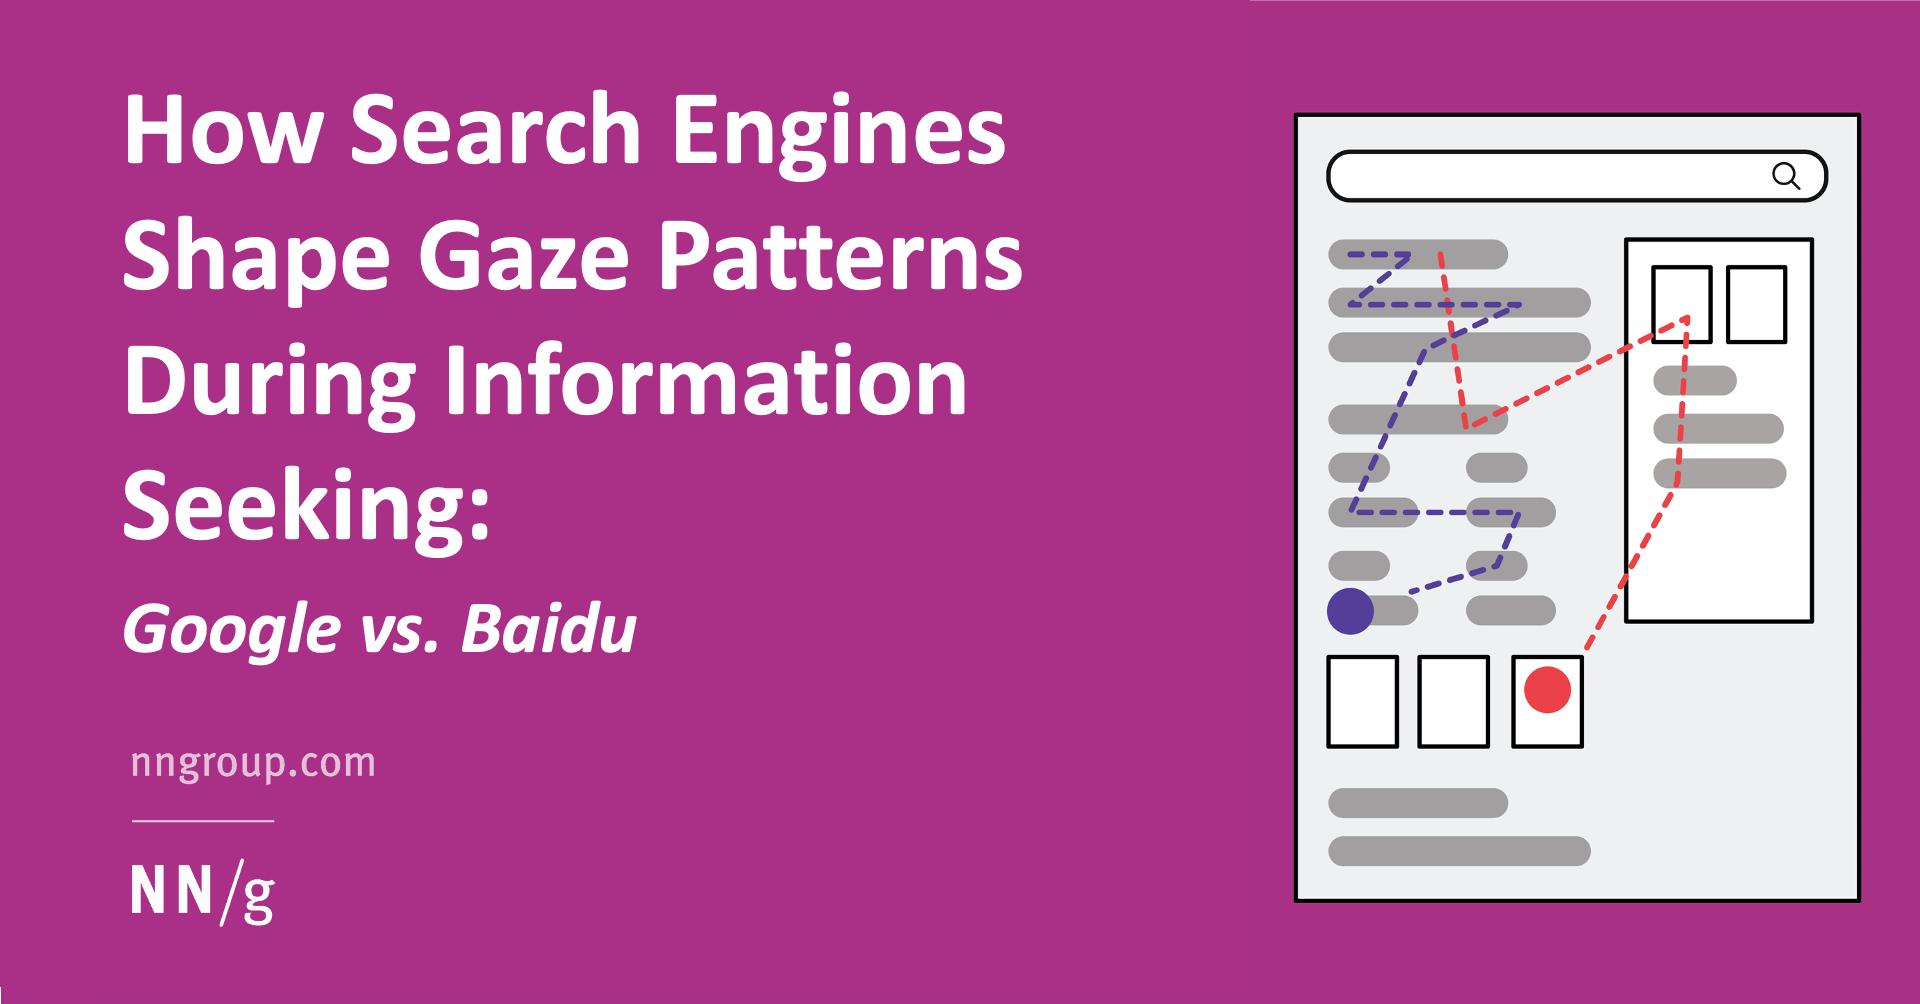 How Search Engines Shape Gaze Patterns During Information Seeking: Google vs. Baidu